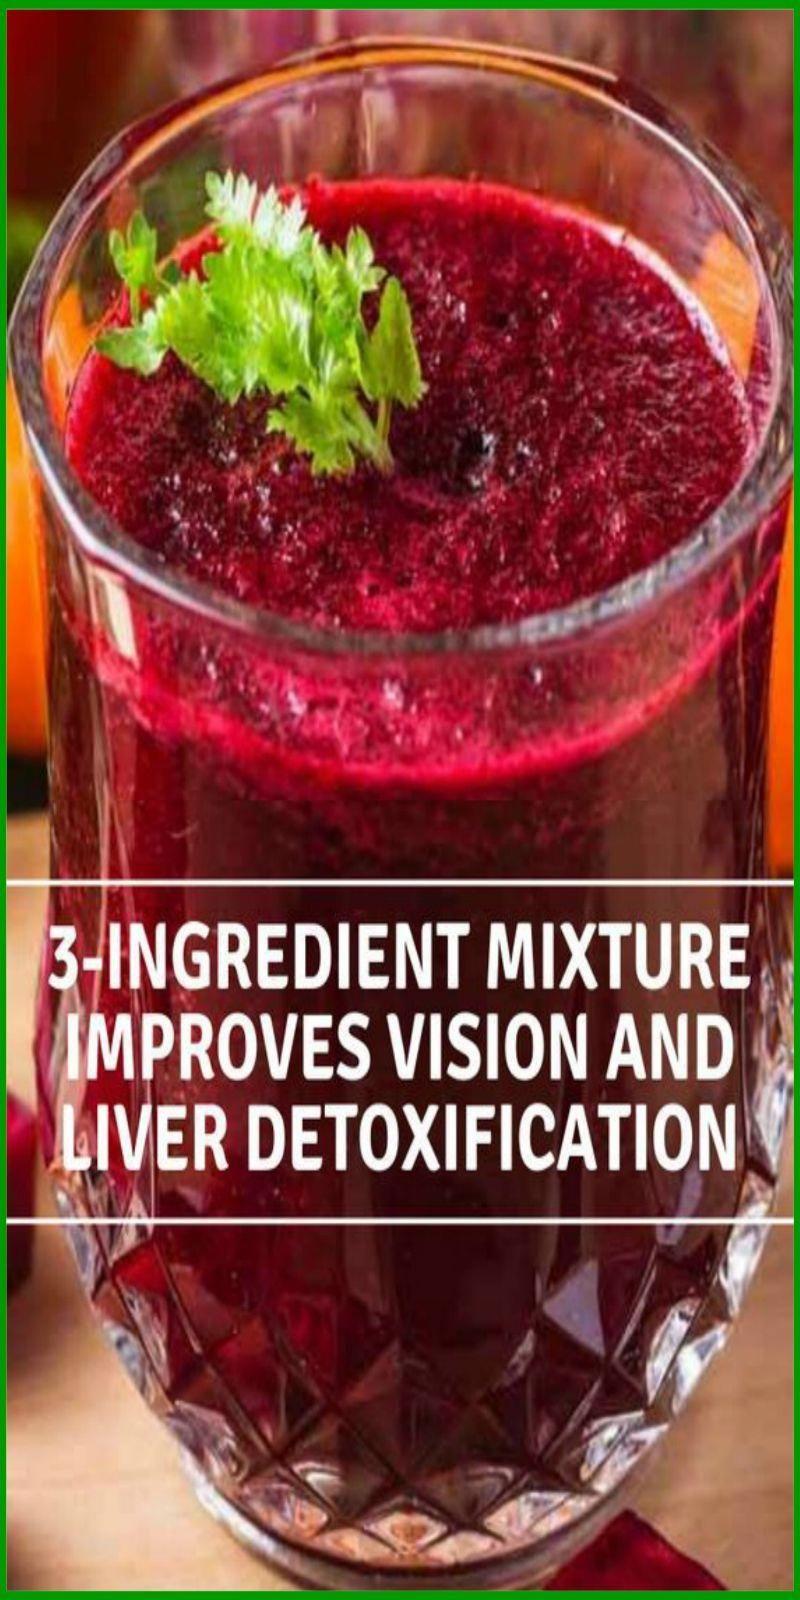 Herbal And Botanical Medicine Naturalcuresandremedies Coconut Health Benefits Liver Detoxification Healthy Drinks